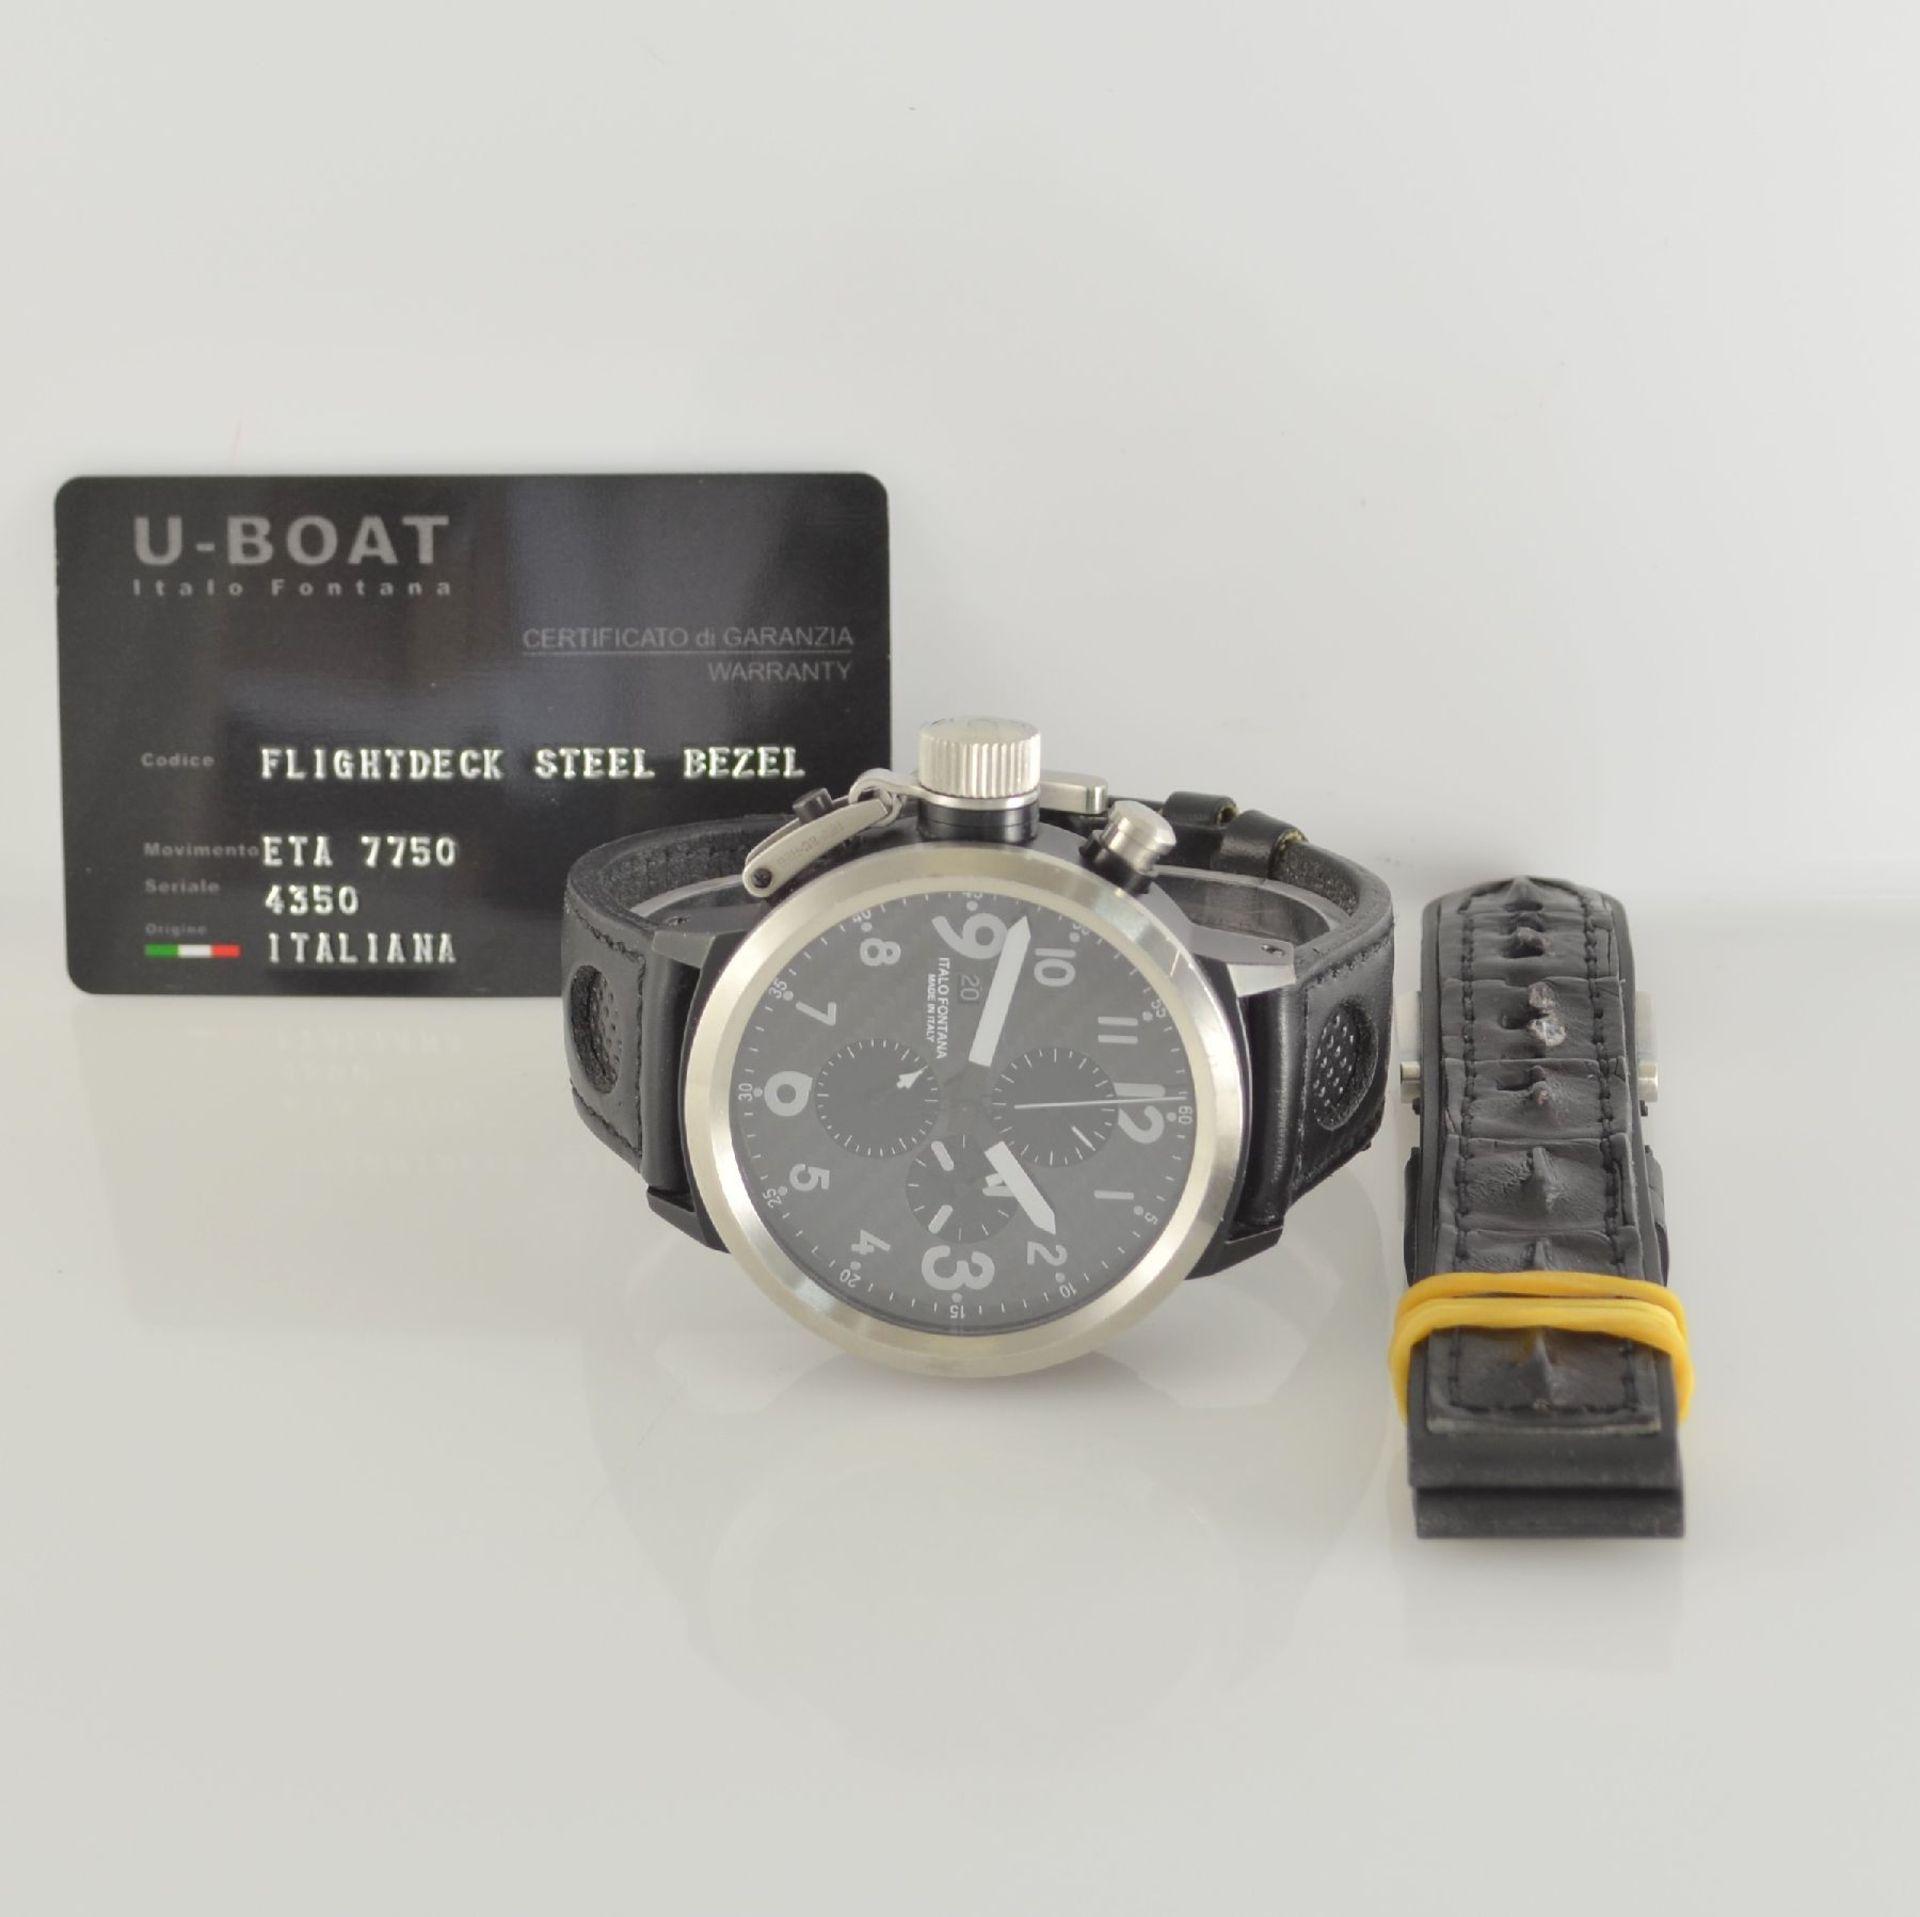 U-BOAT Italo Fontana Herrenarmbanduhr mit Chronograph Model Flightdeck, Automatik, Italien um - Bild 5 aus 5